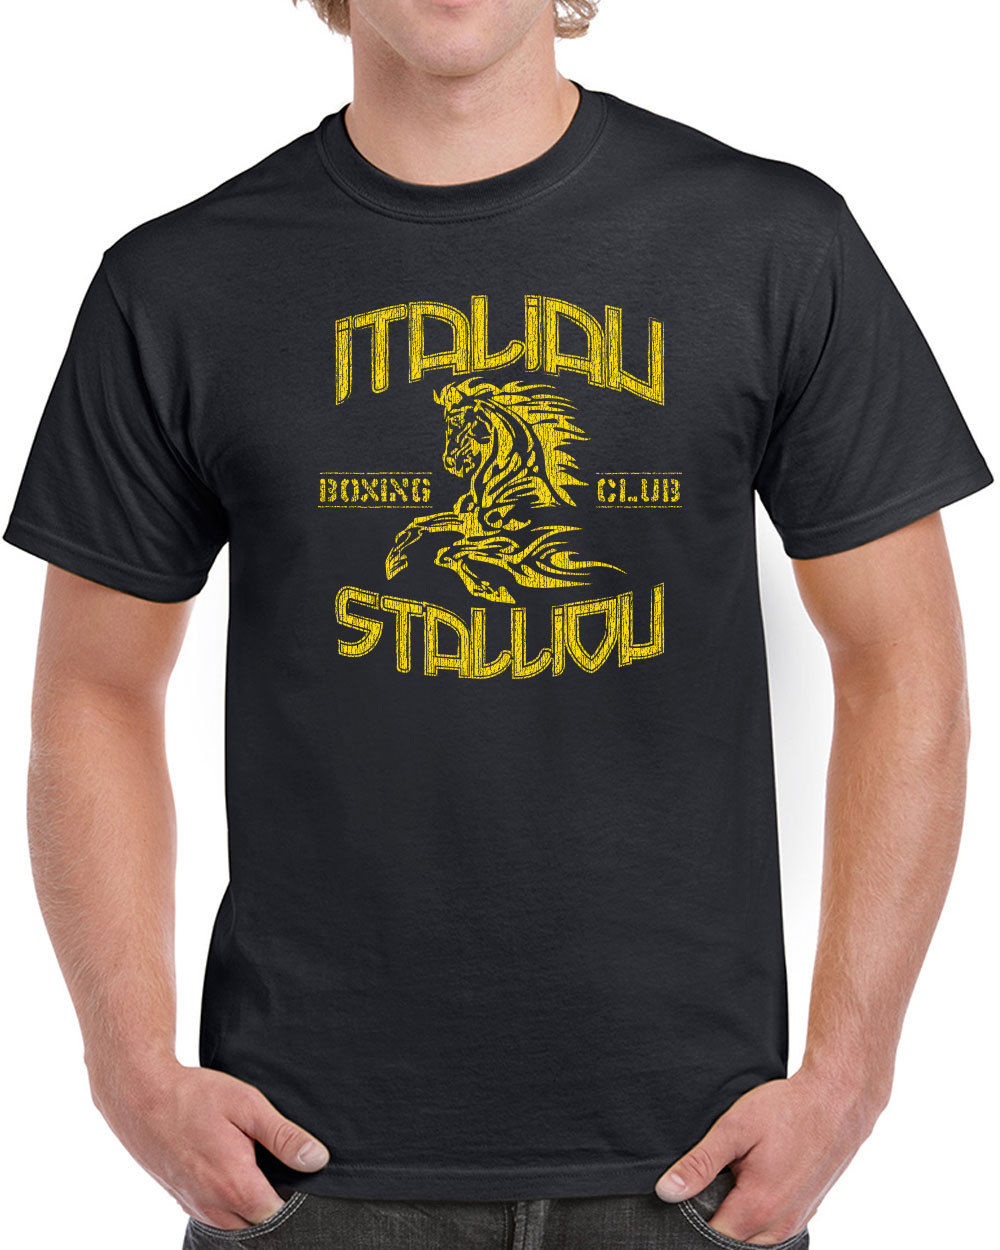 Shirt design vintage - Online T Shirts Design Crew Neck Short Sleeve Zomer Italian Stallion Funny Rocky Movie 70s